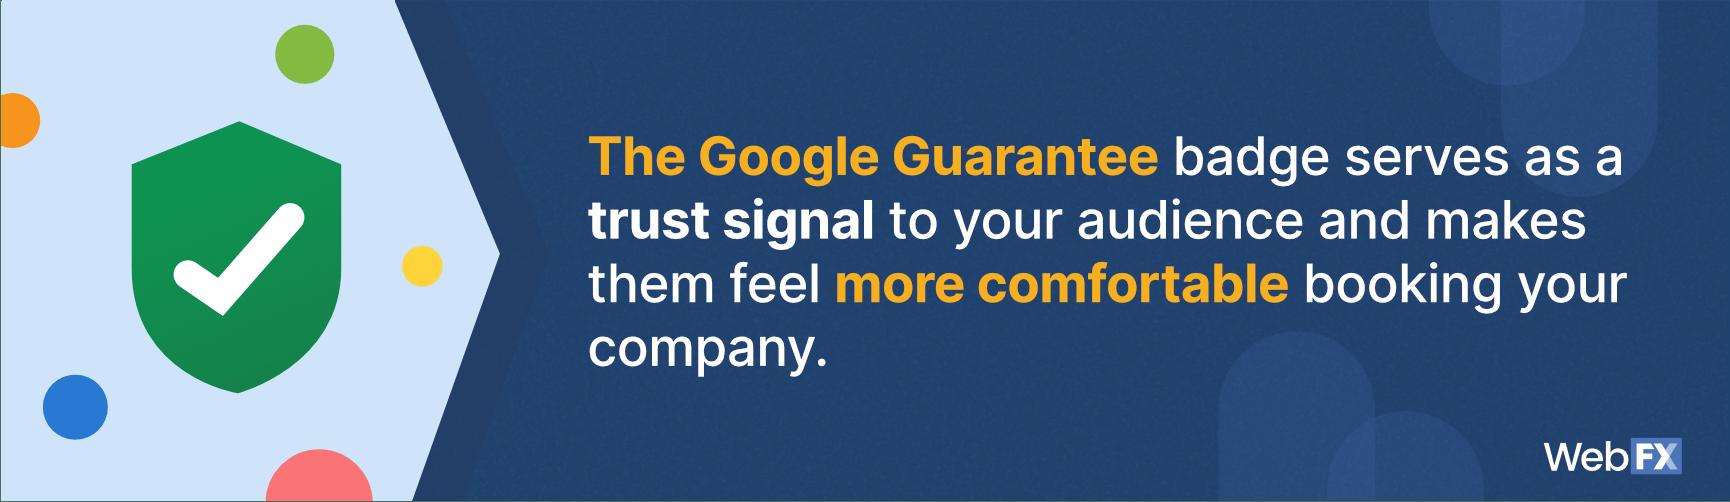 Google Guarantee Badge